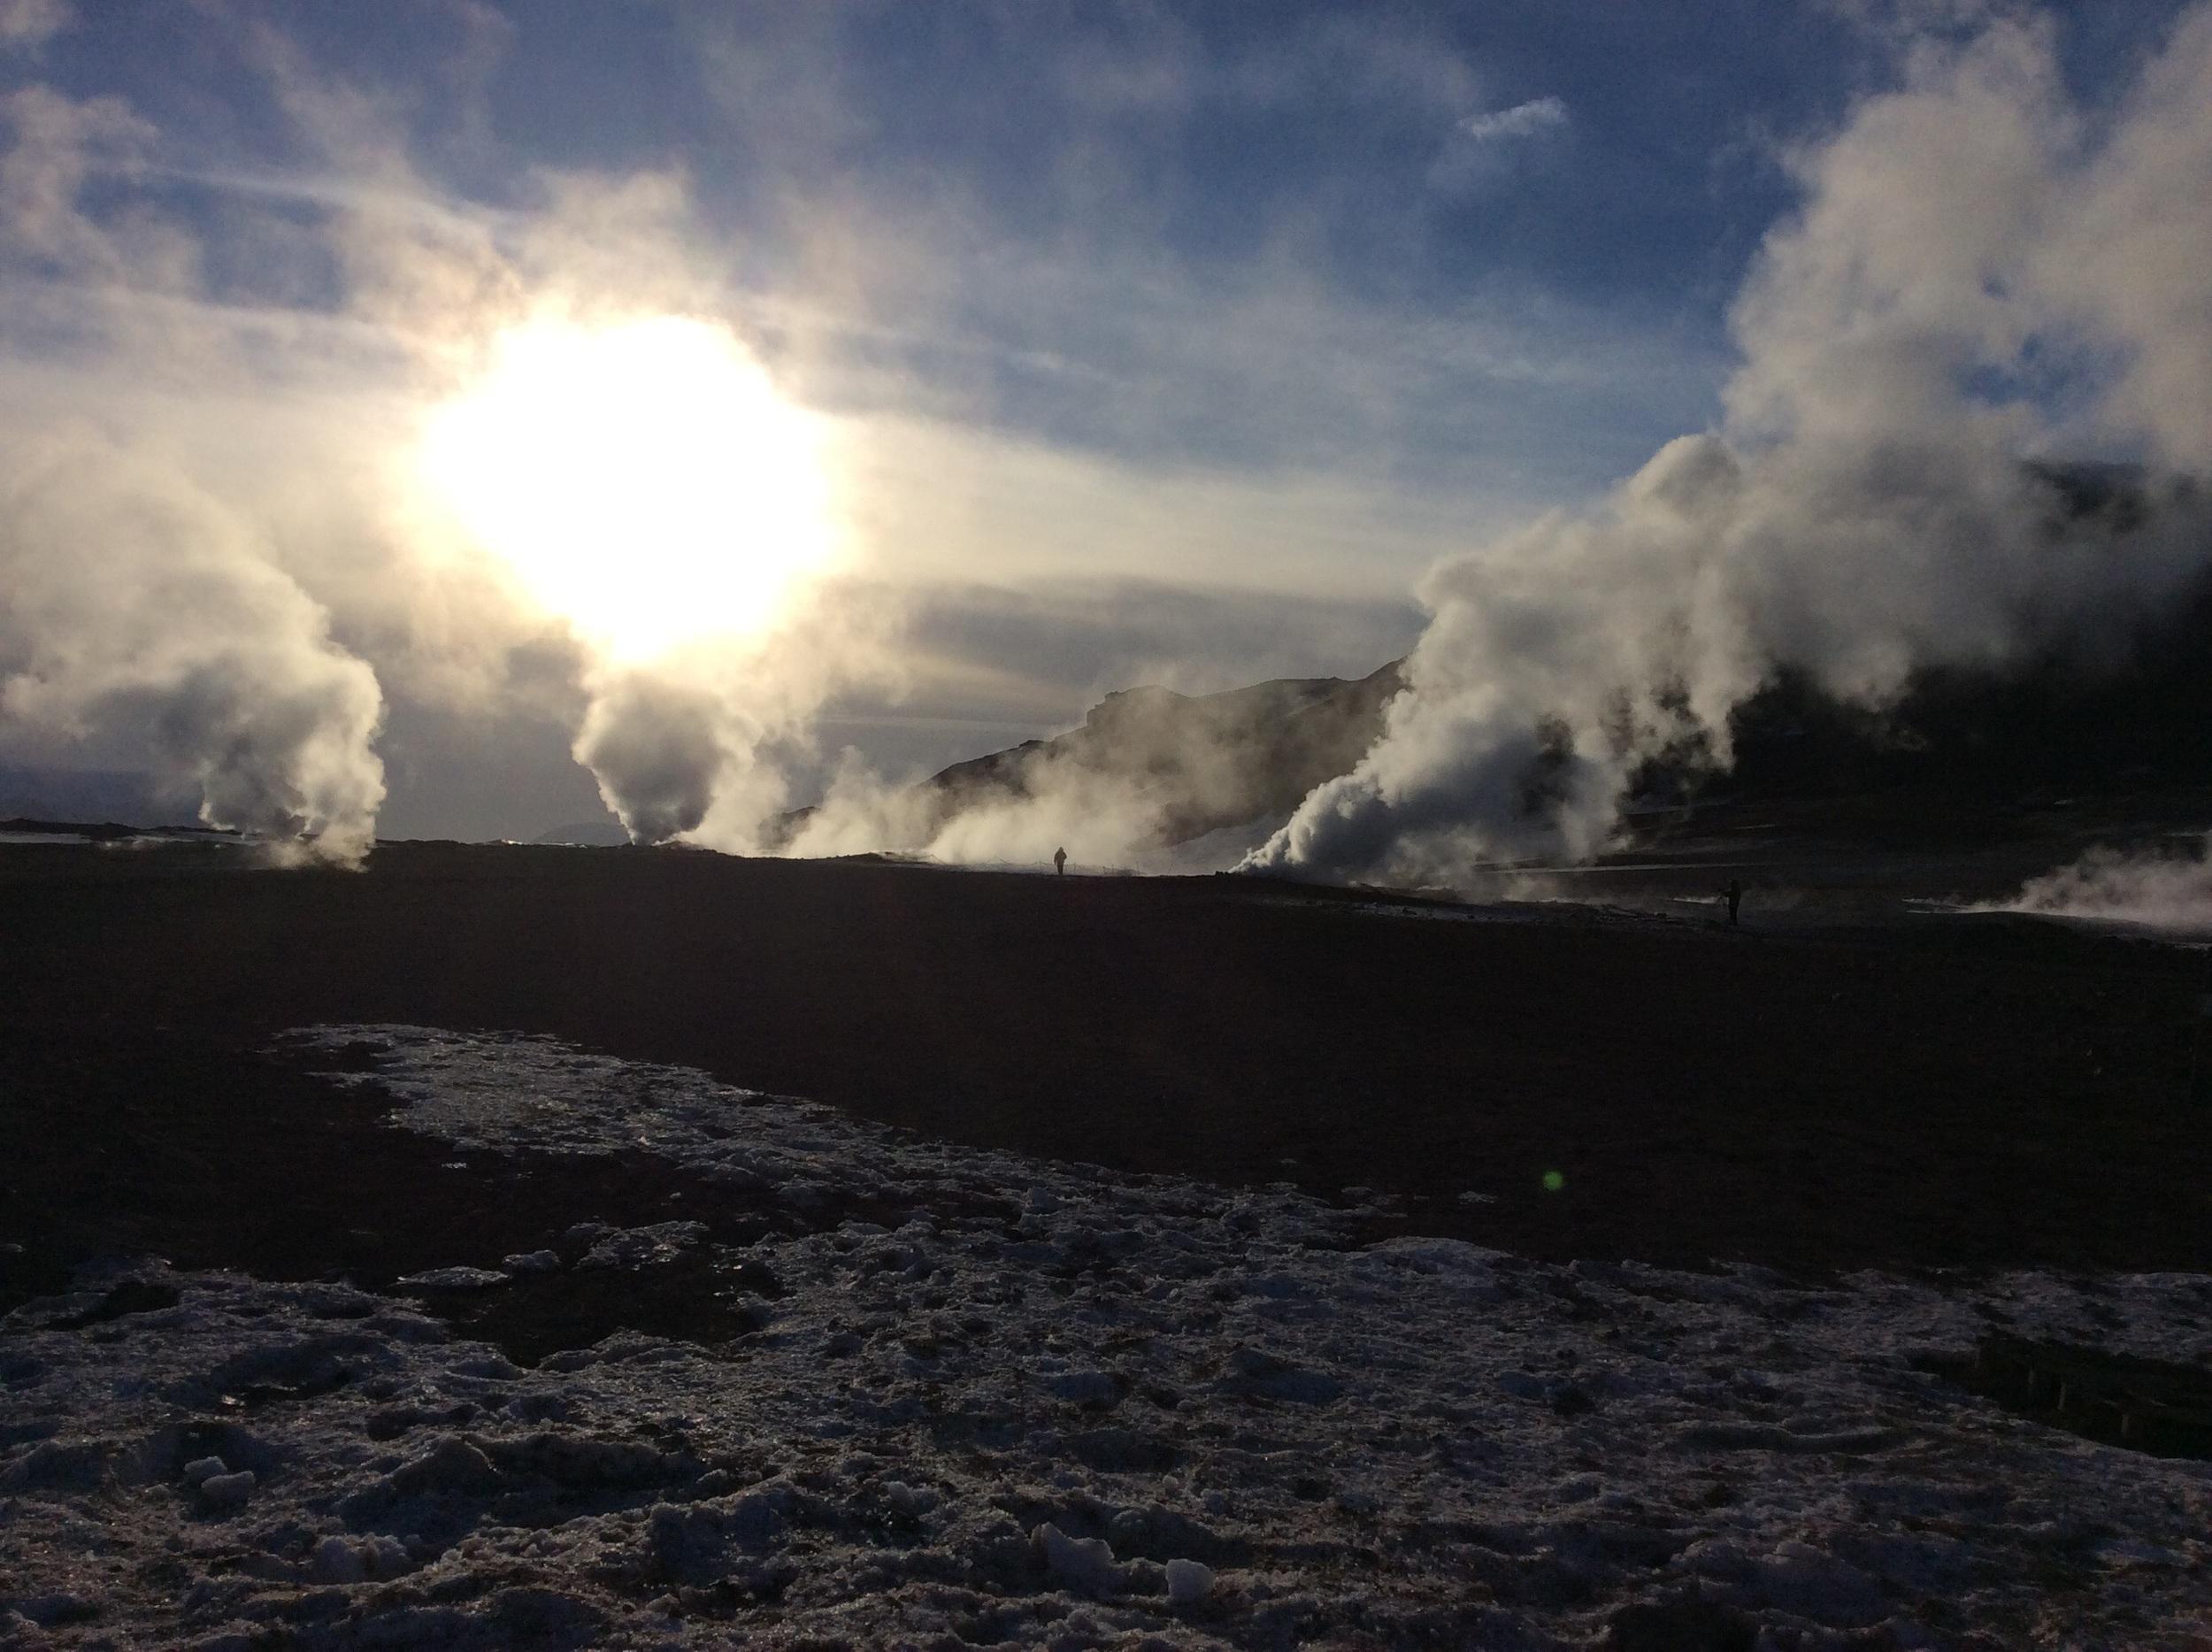 Geothermal field emitting sulfur-laden gases